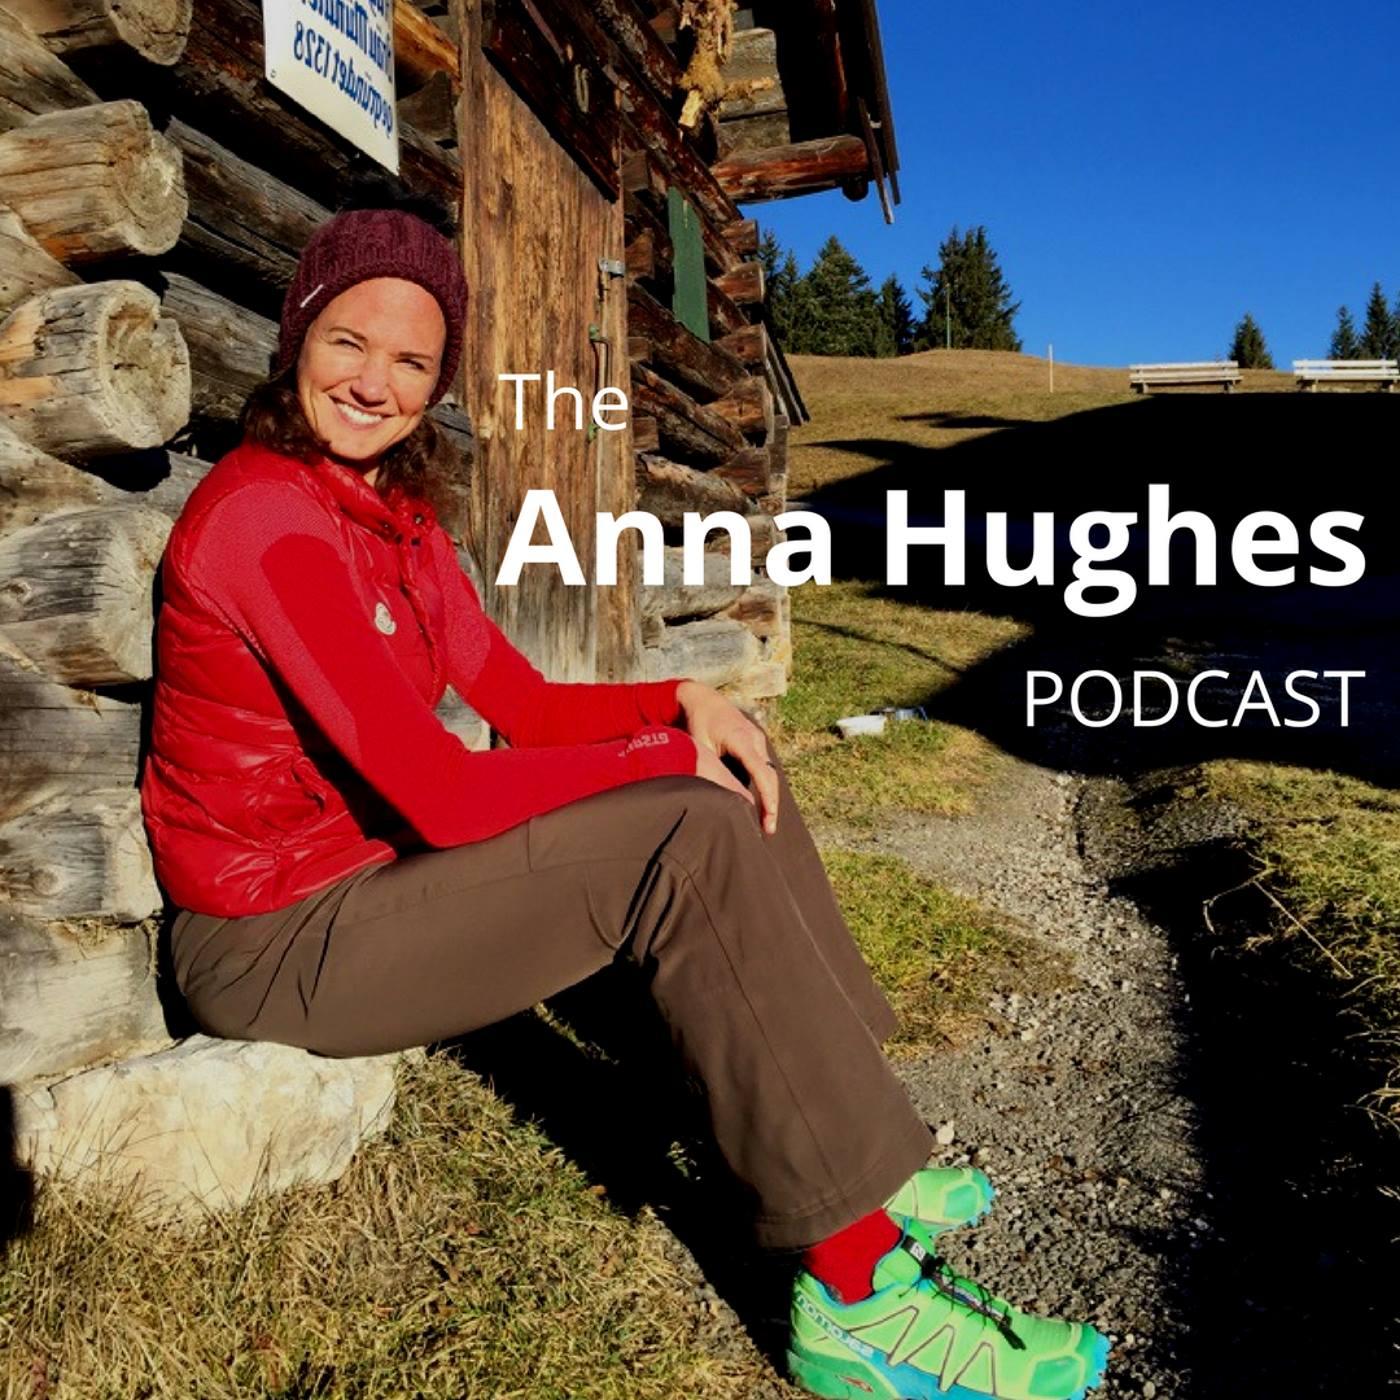 Going Ultra - Dein Weg zum Ultramarathon